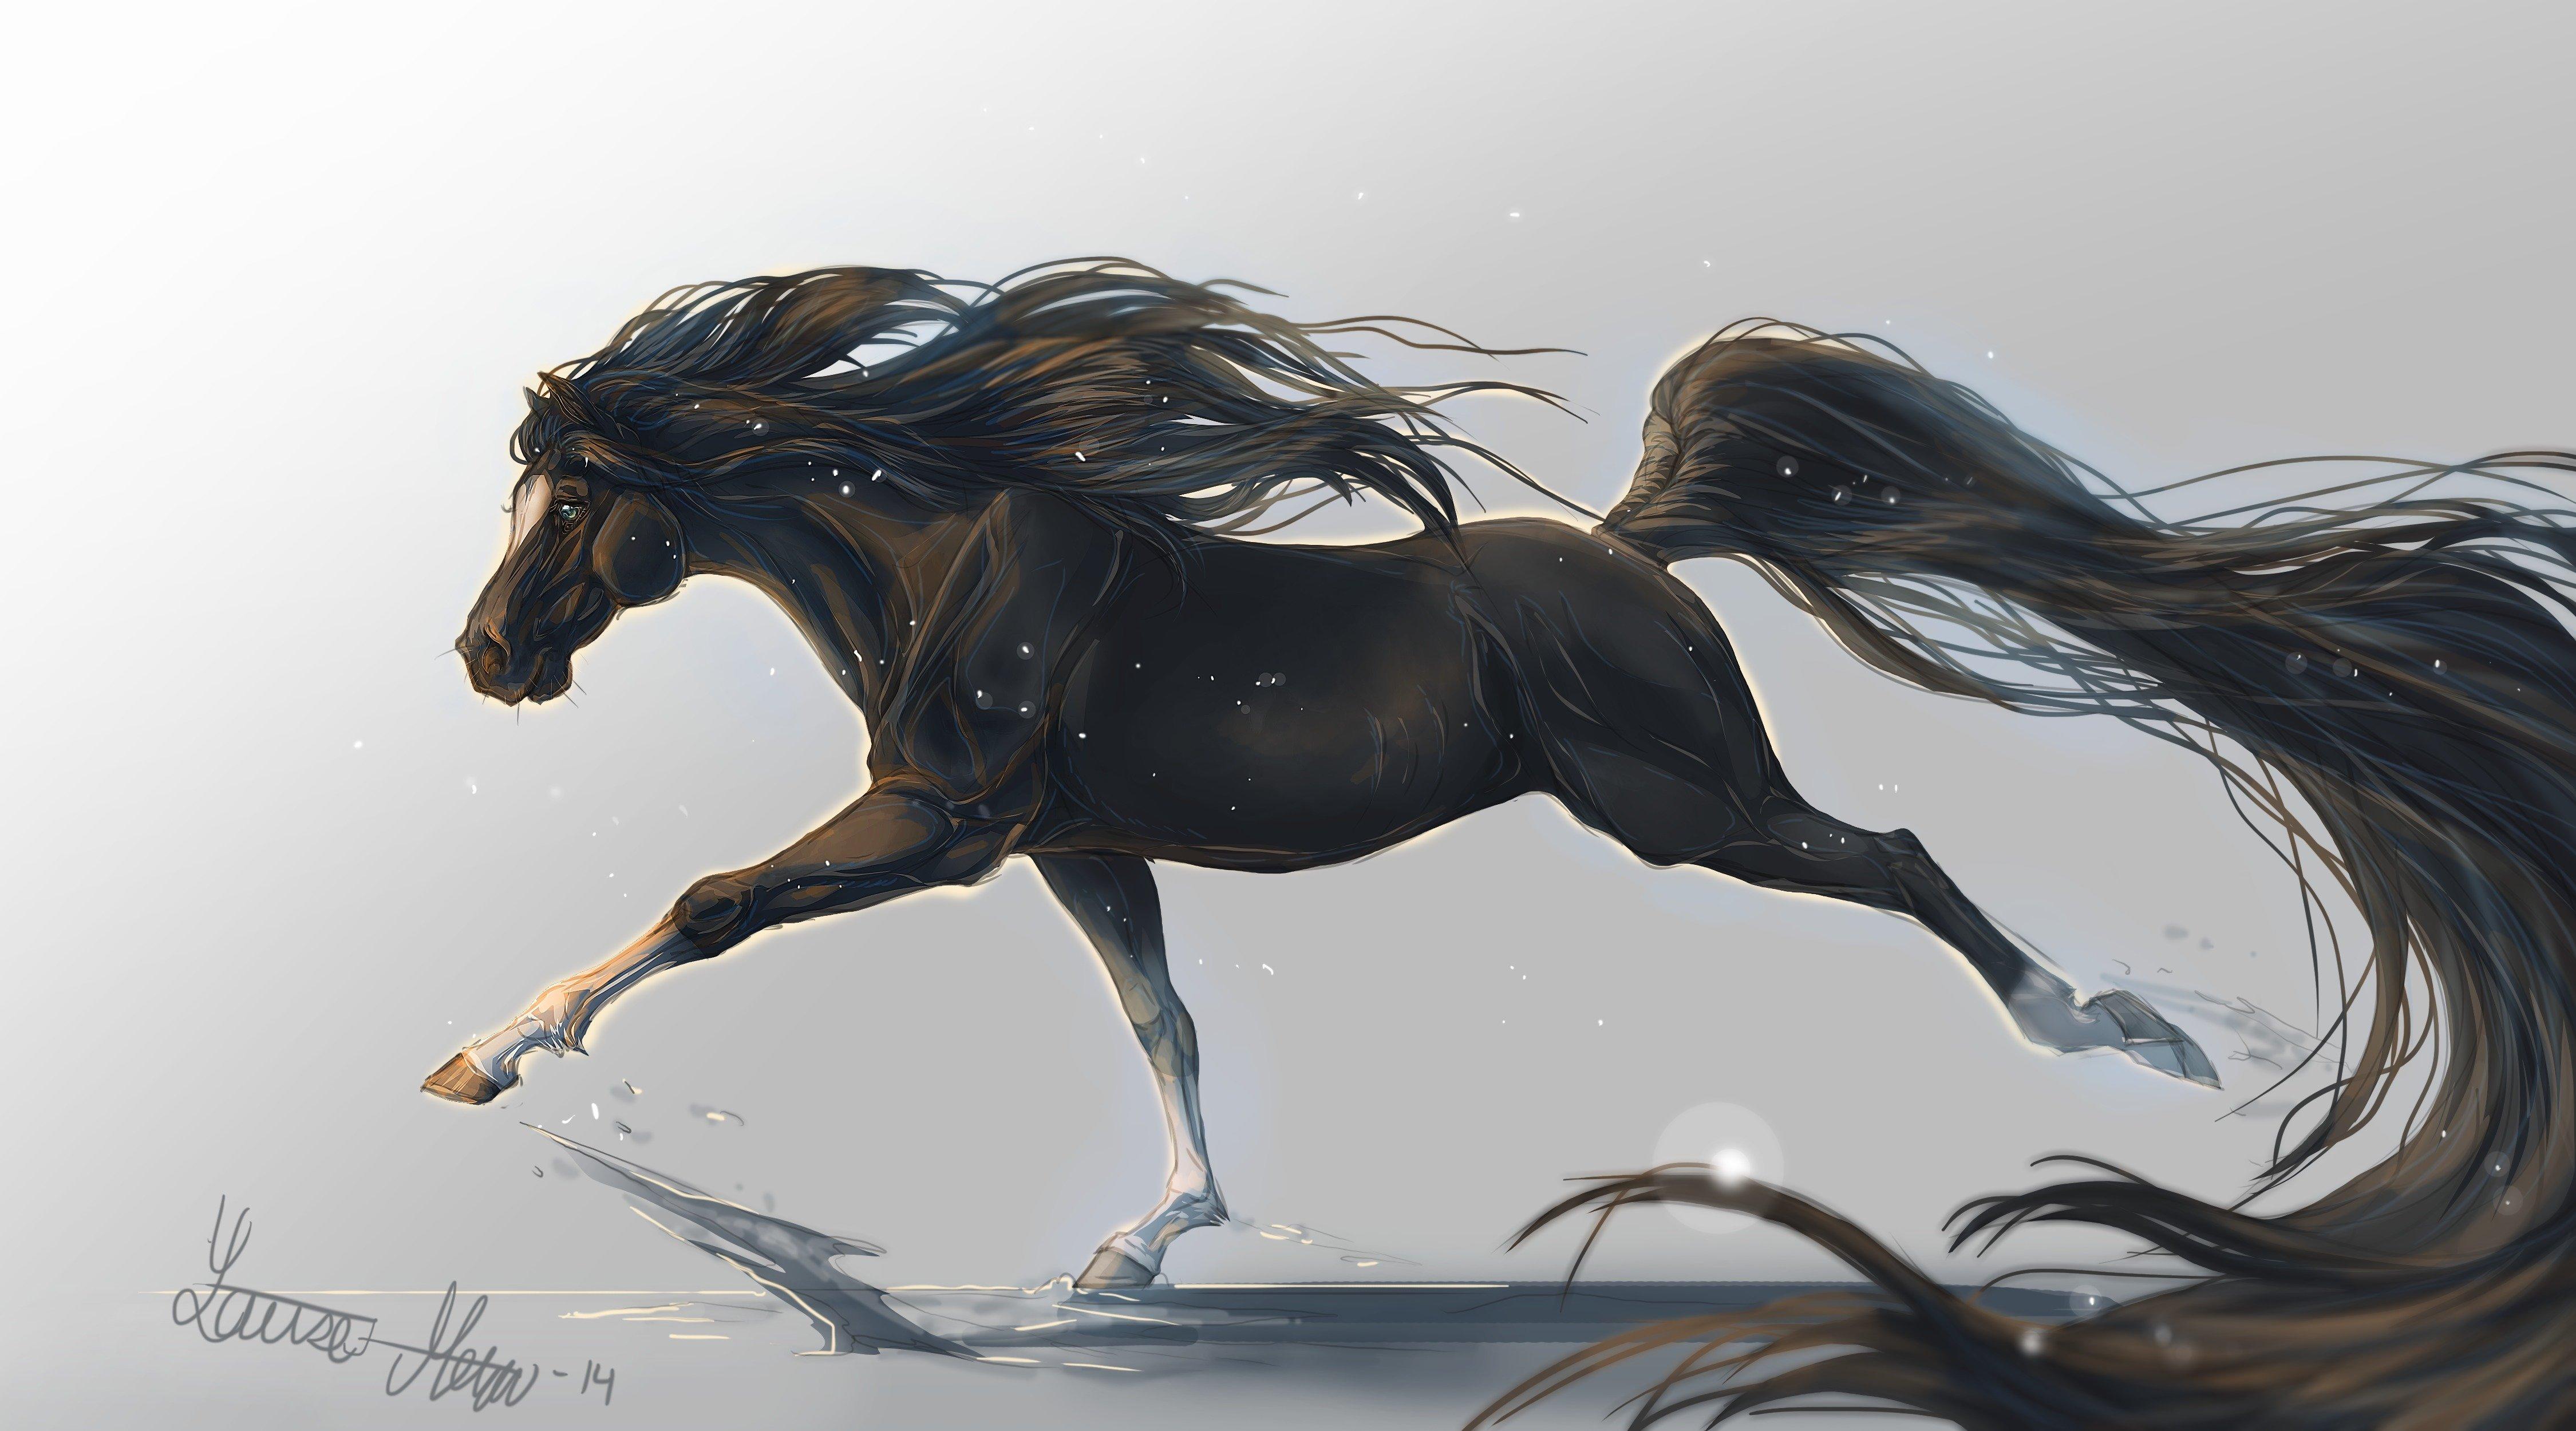 horse horse art tail animal griva hooves wallpaper 4500x2500 wallpaperup